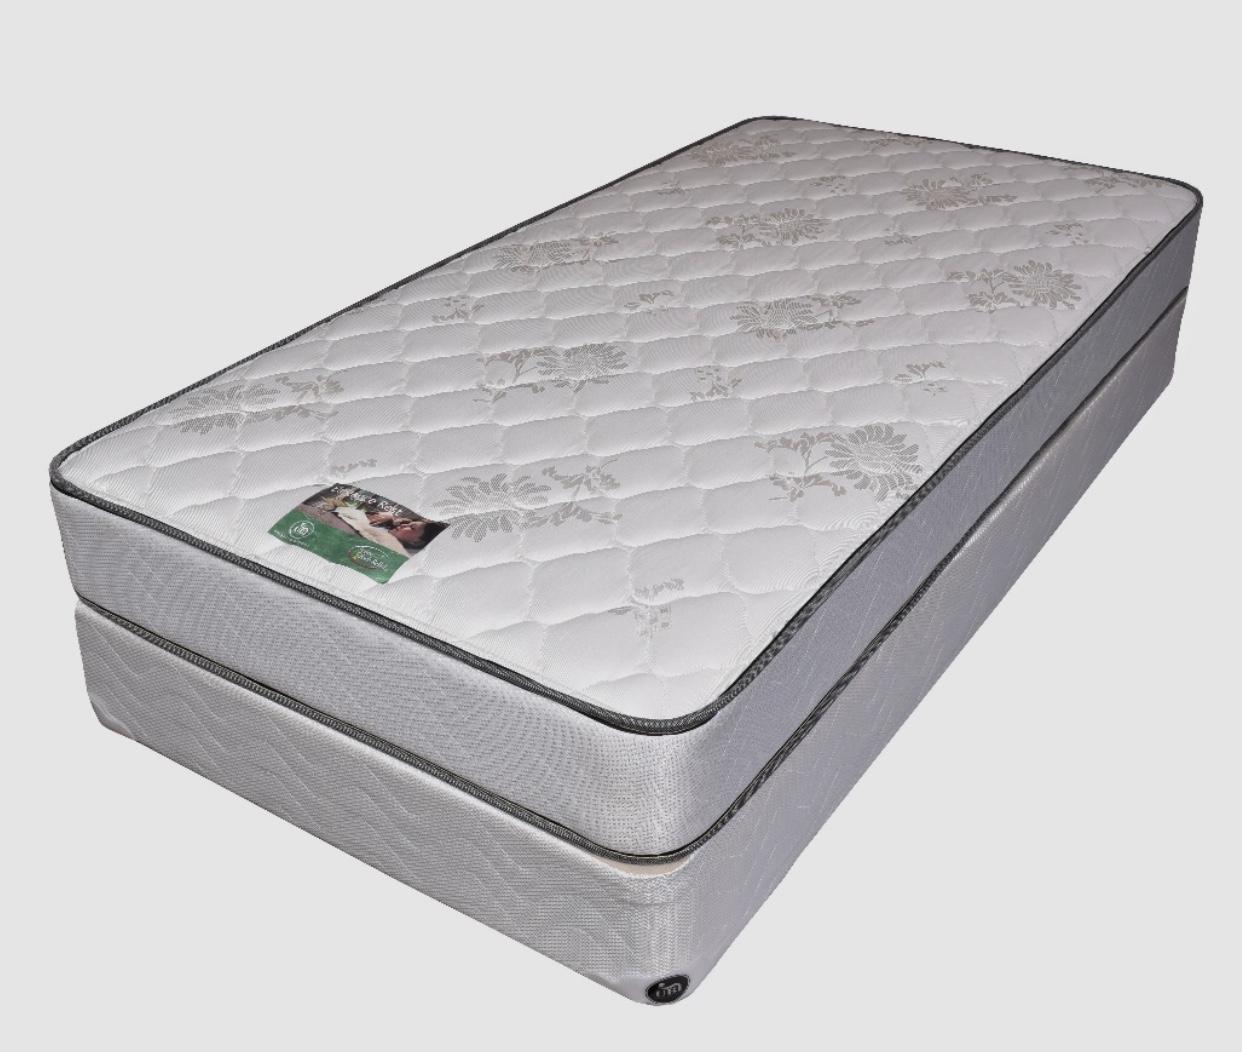 Custom Size Memory Foam Mattress: Custom Mattress In Any Shape Or Size